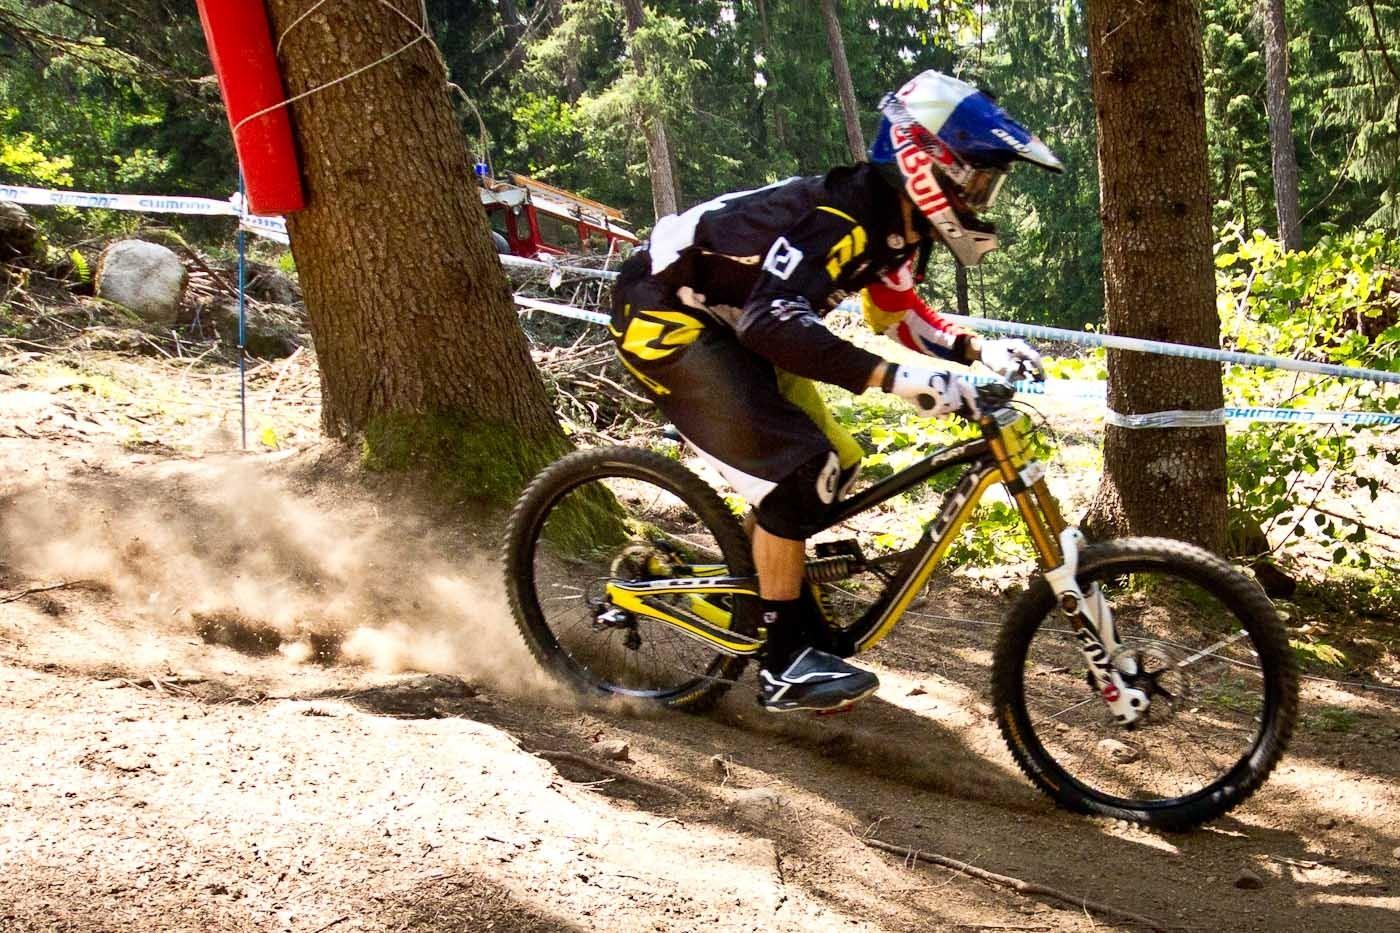 World events: Пробитые подвески прямиком из Val di Sole 2013 года